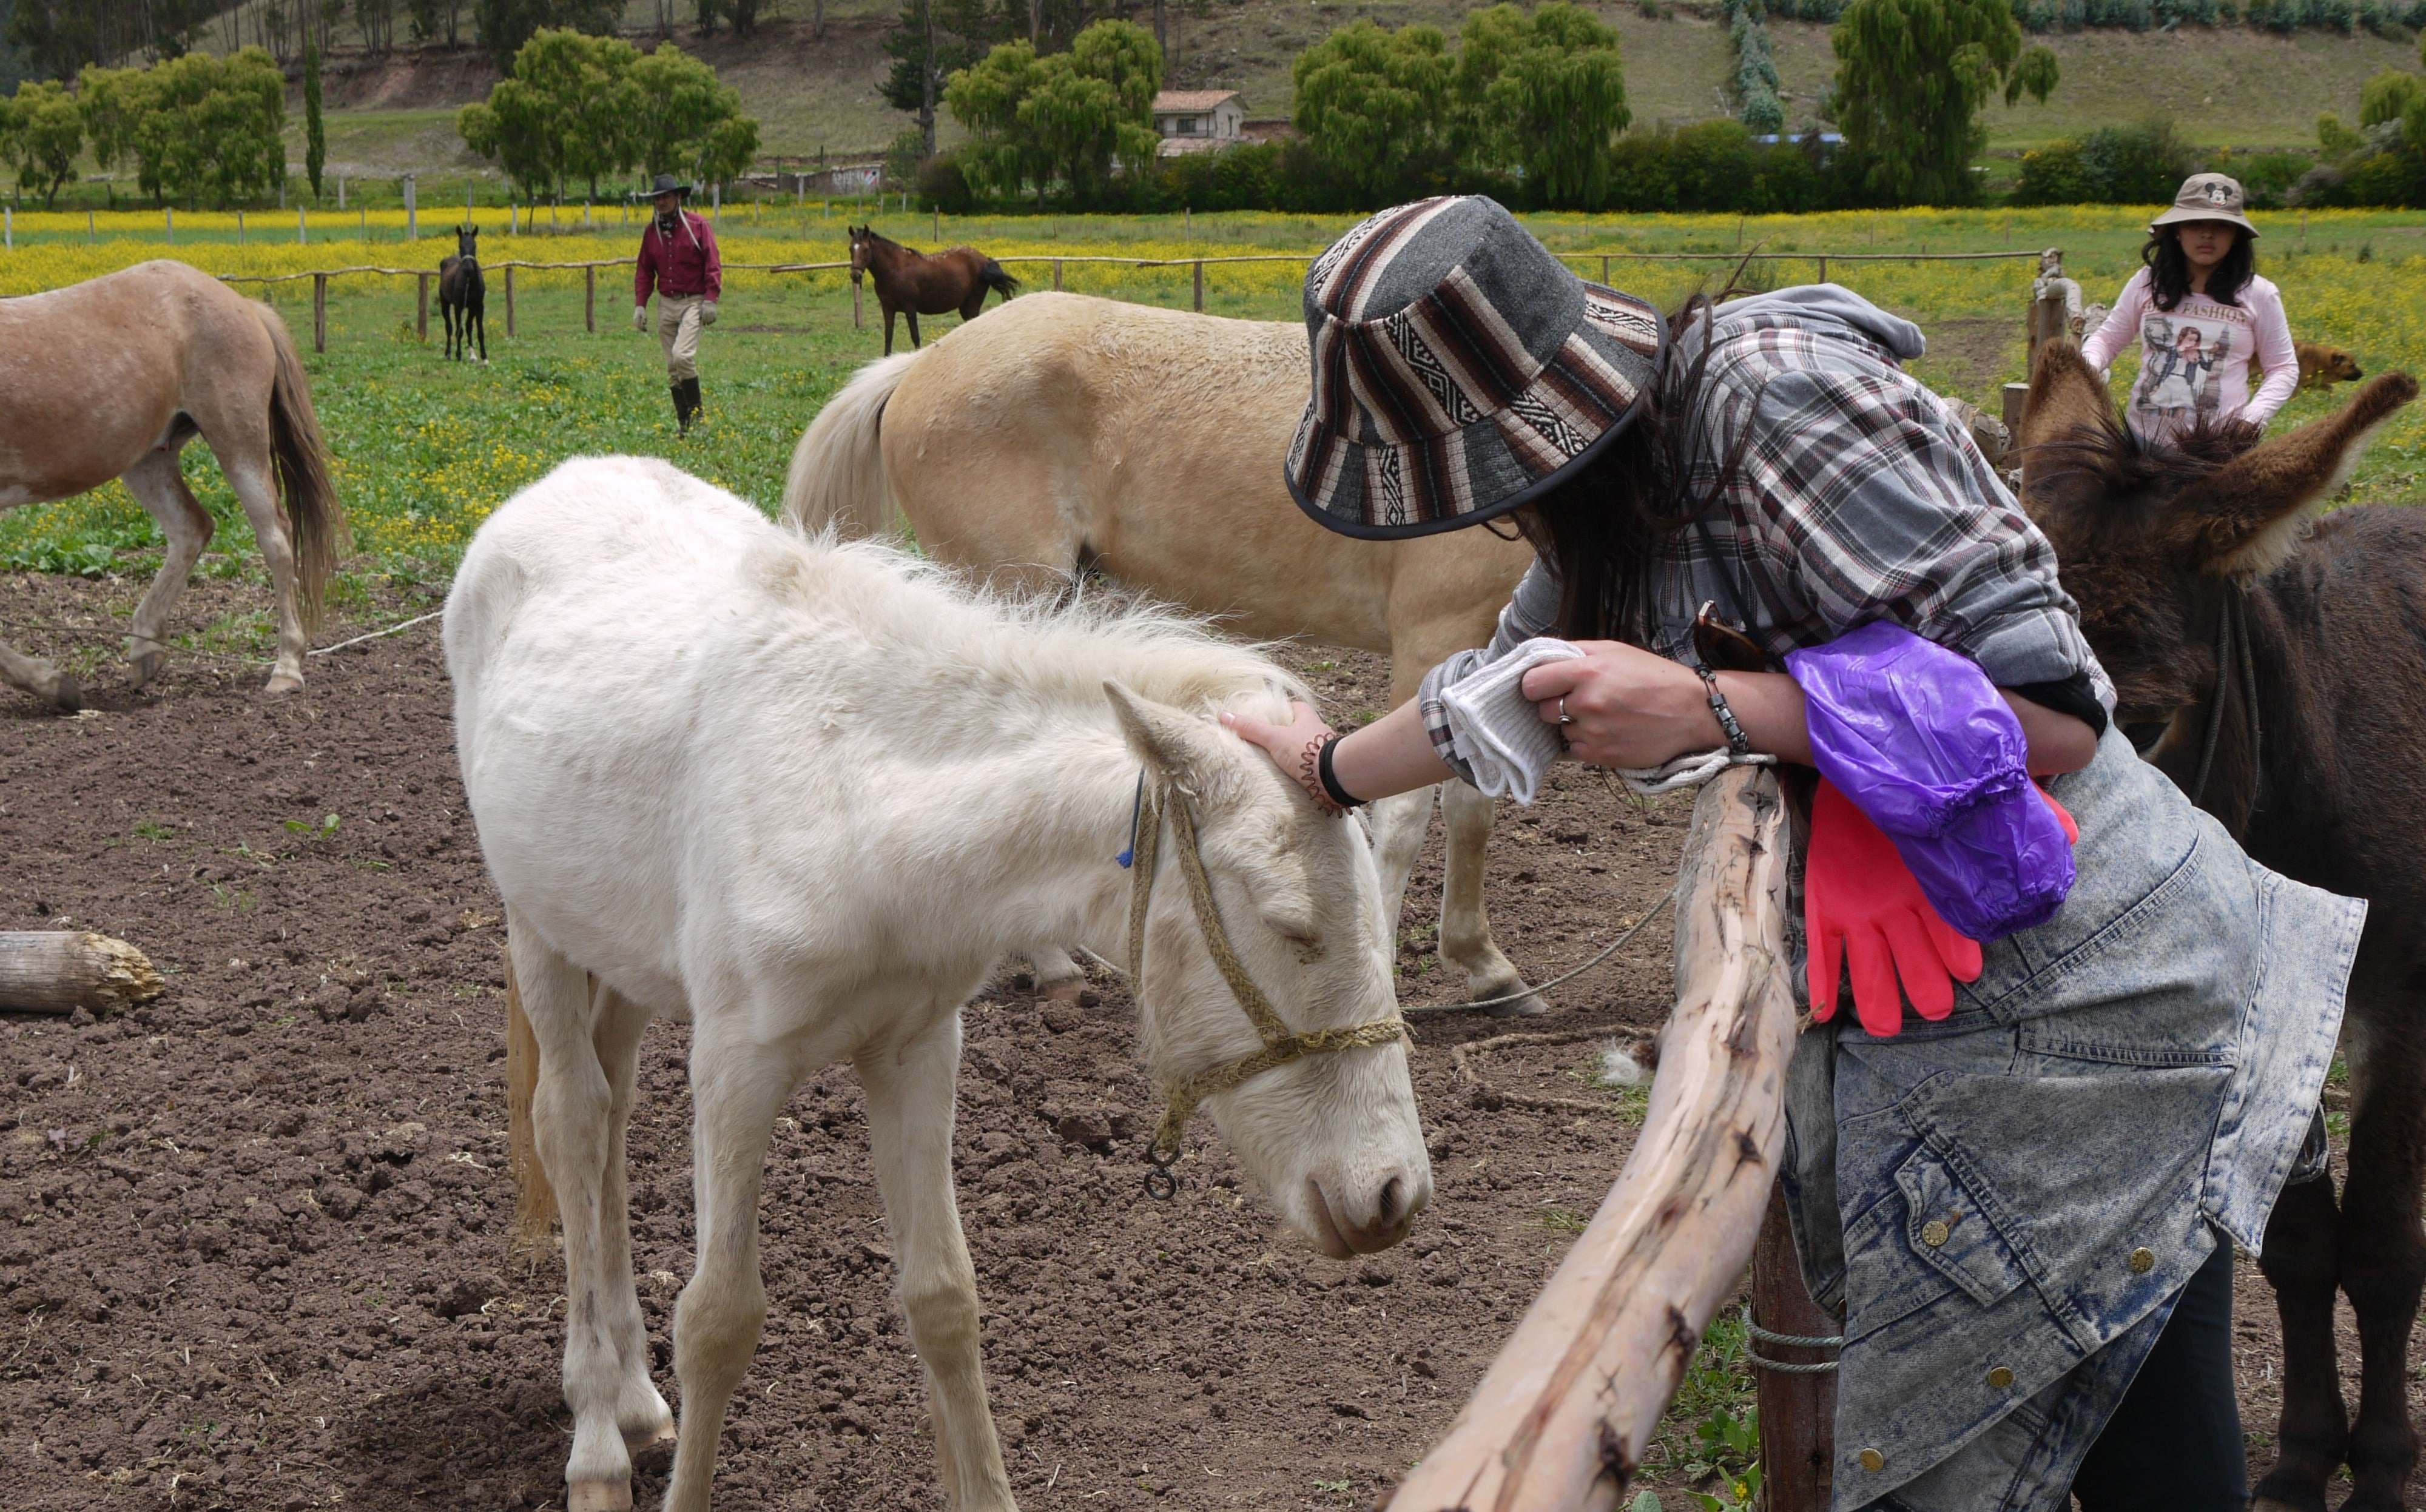 Volunteer meeting Rescued Horse at Horse Sanctuary